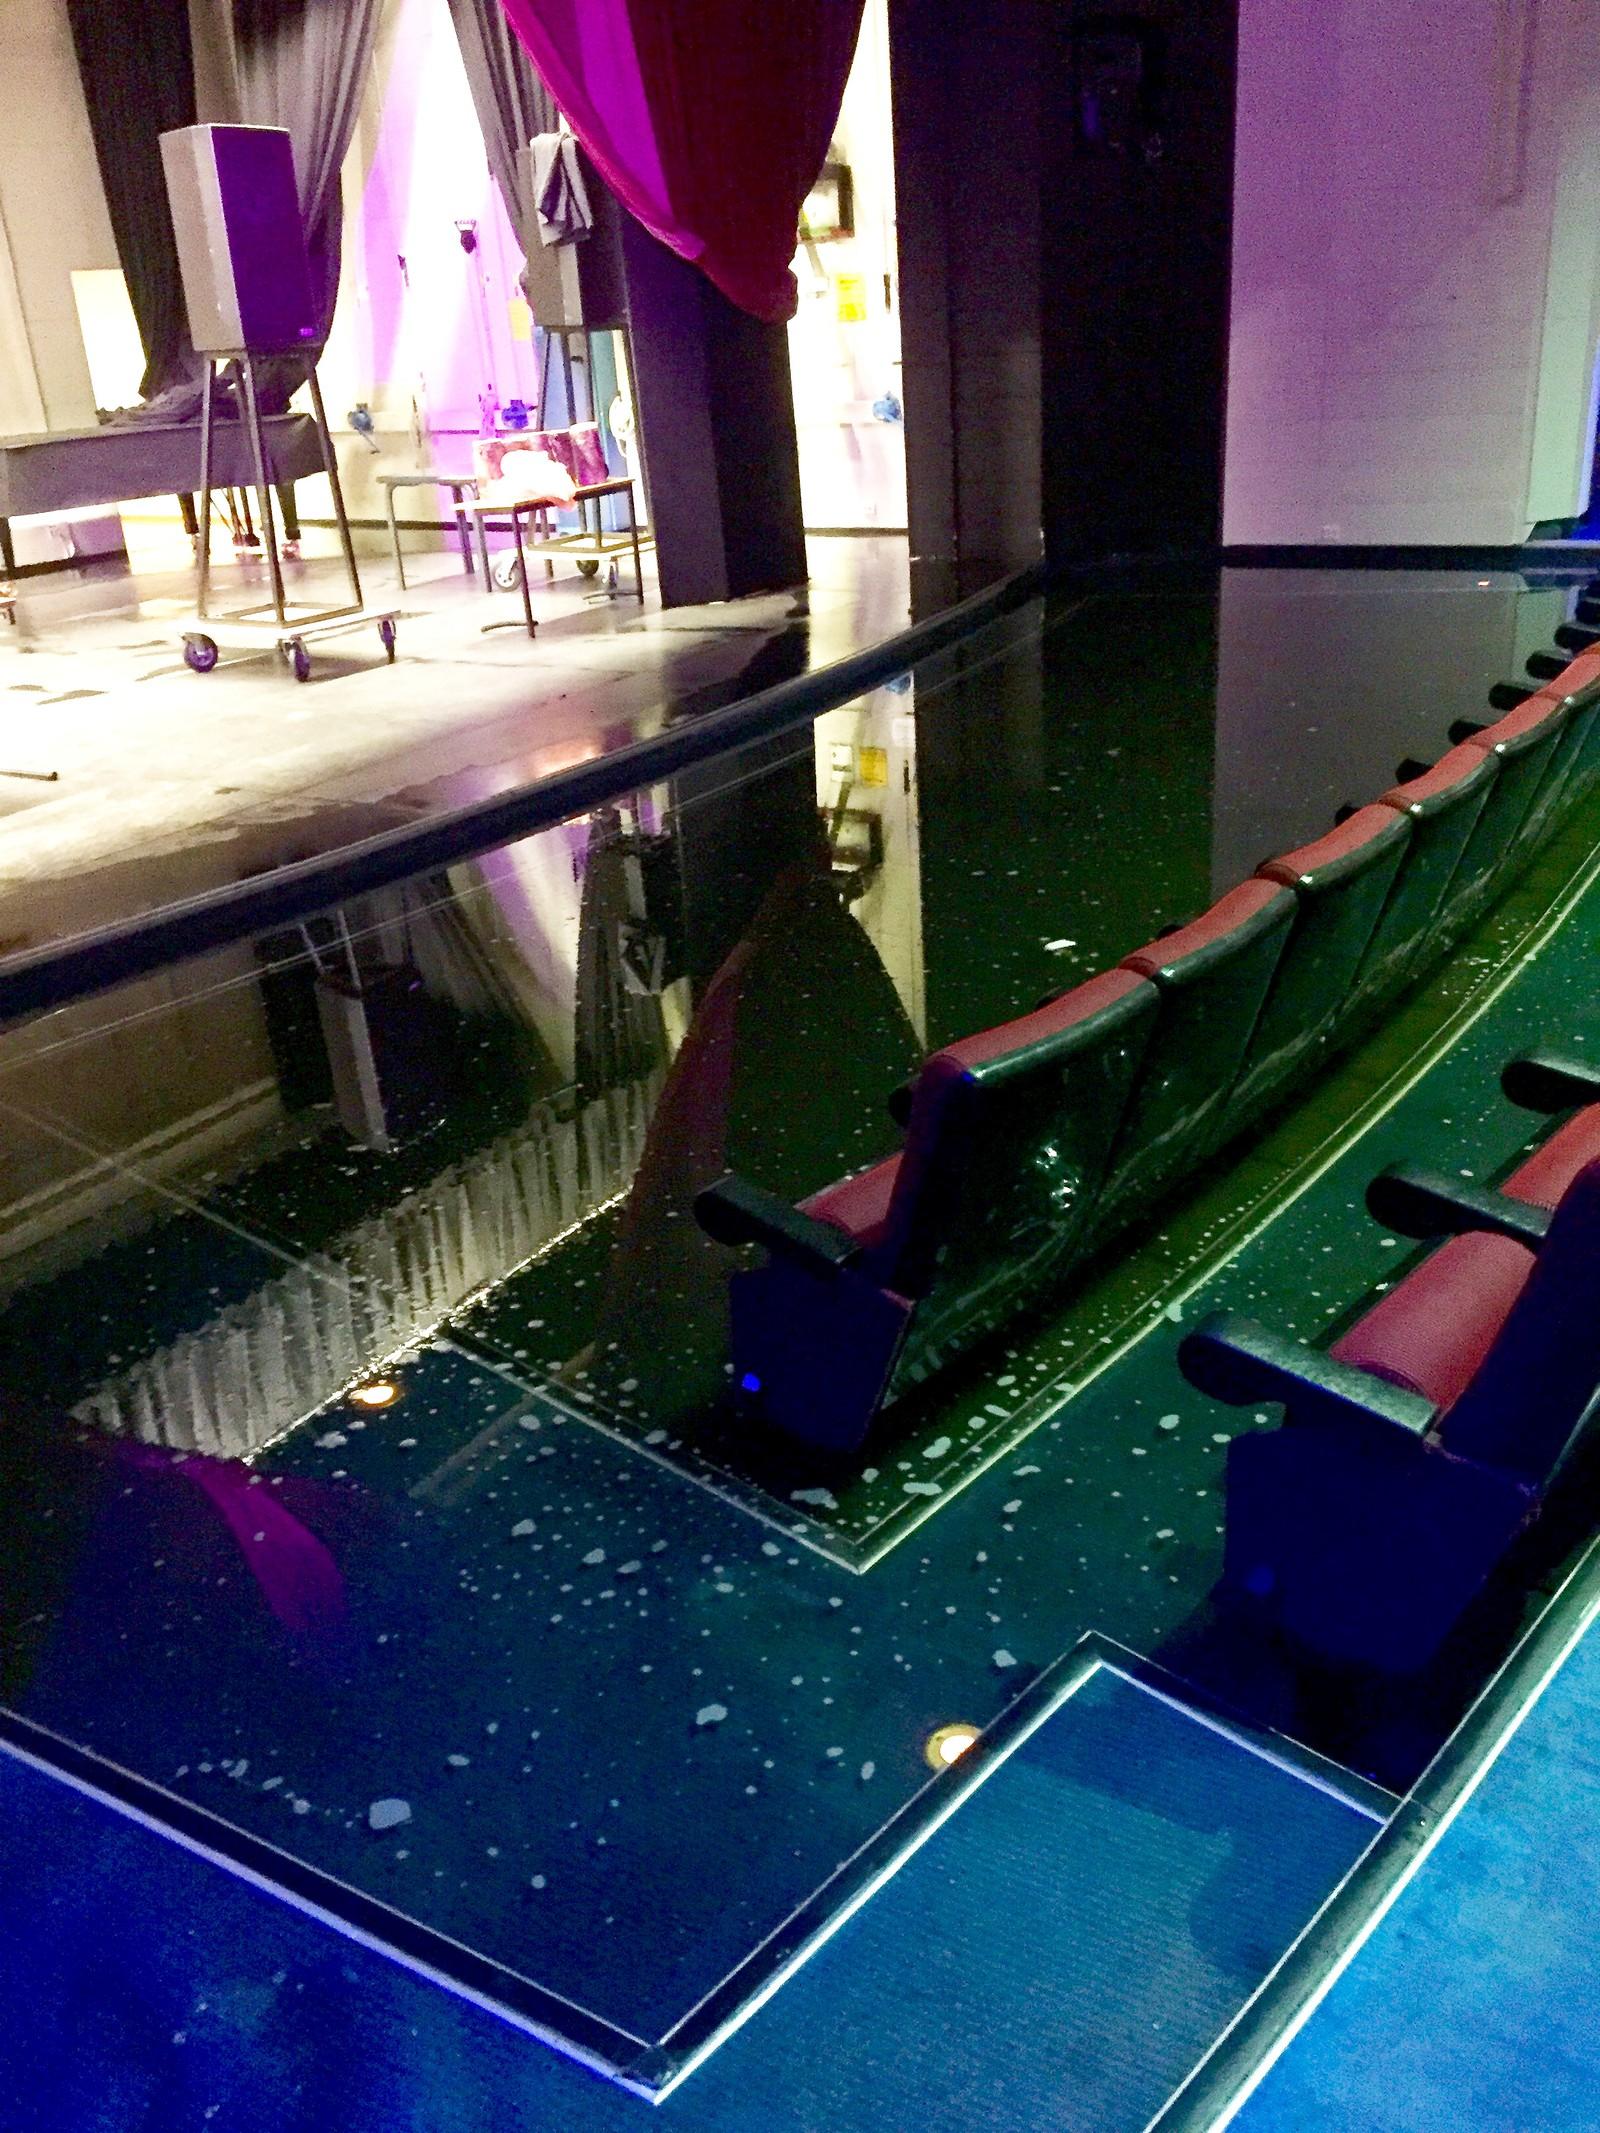 Oversvømmelse i kulturhuset i Kvinesdal.